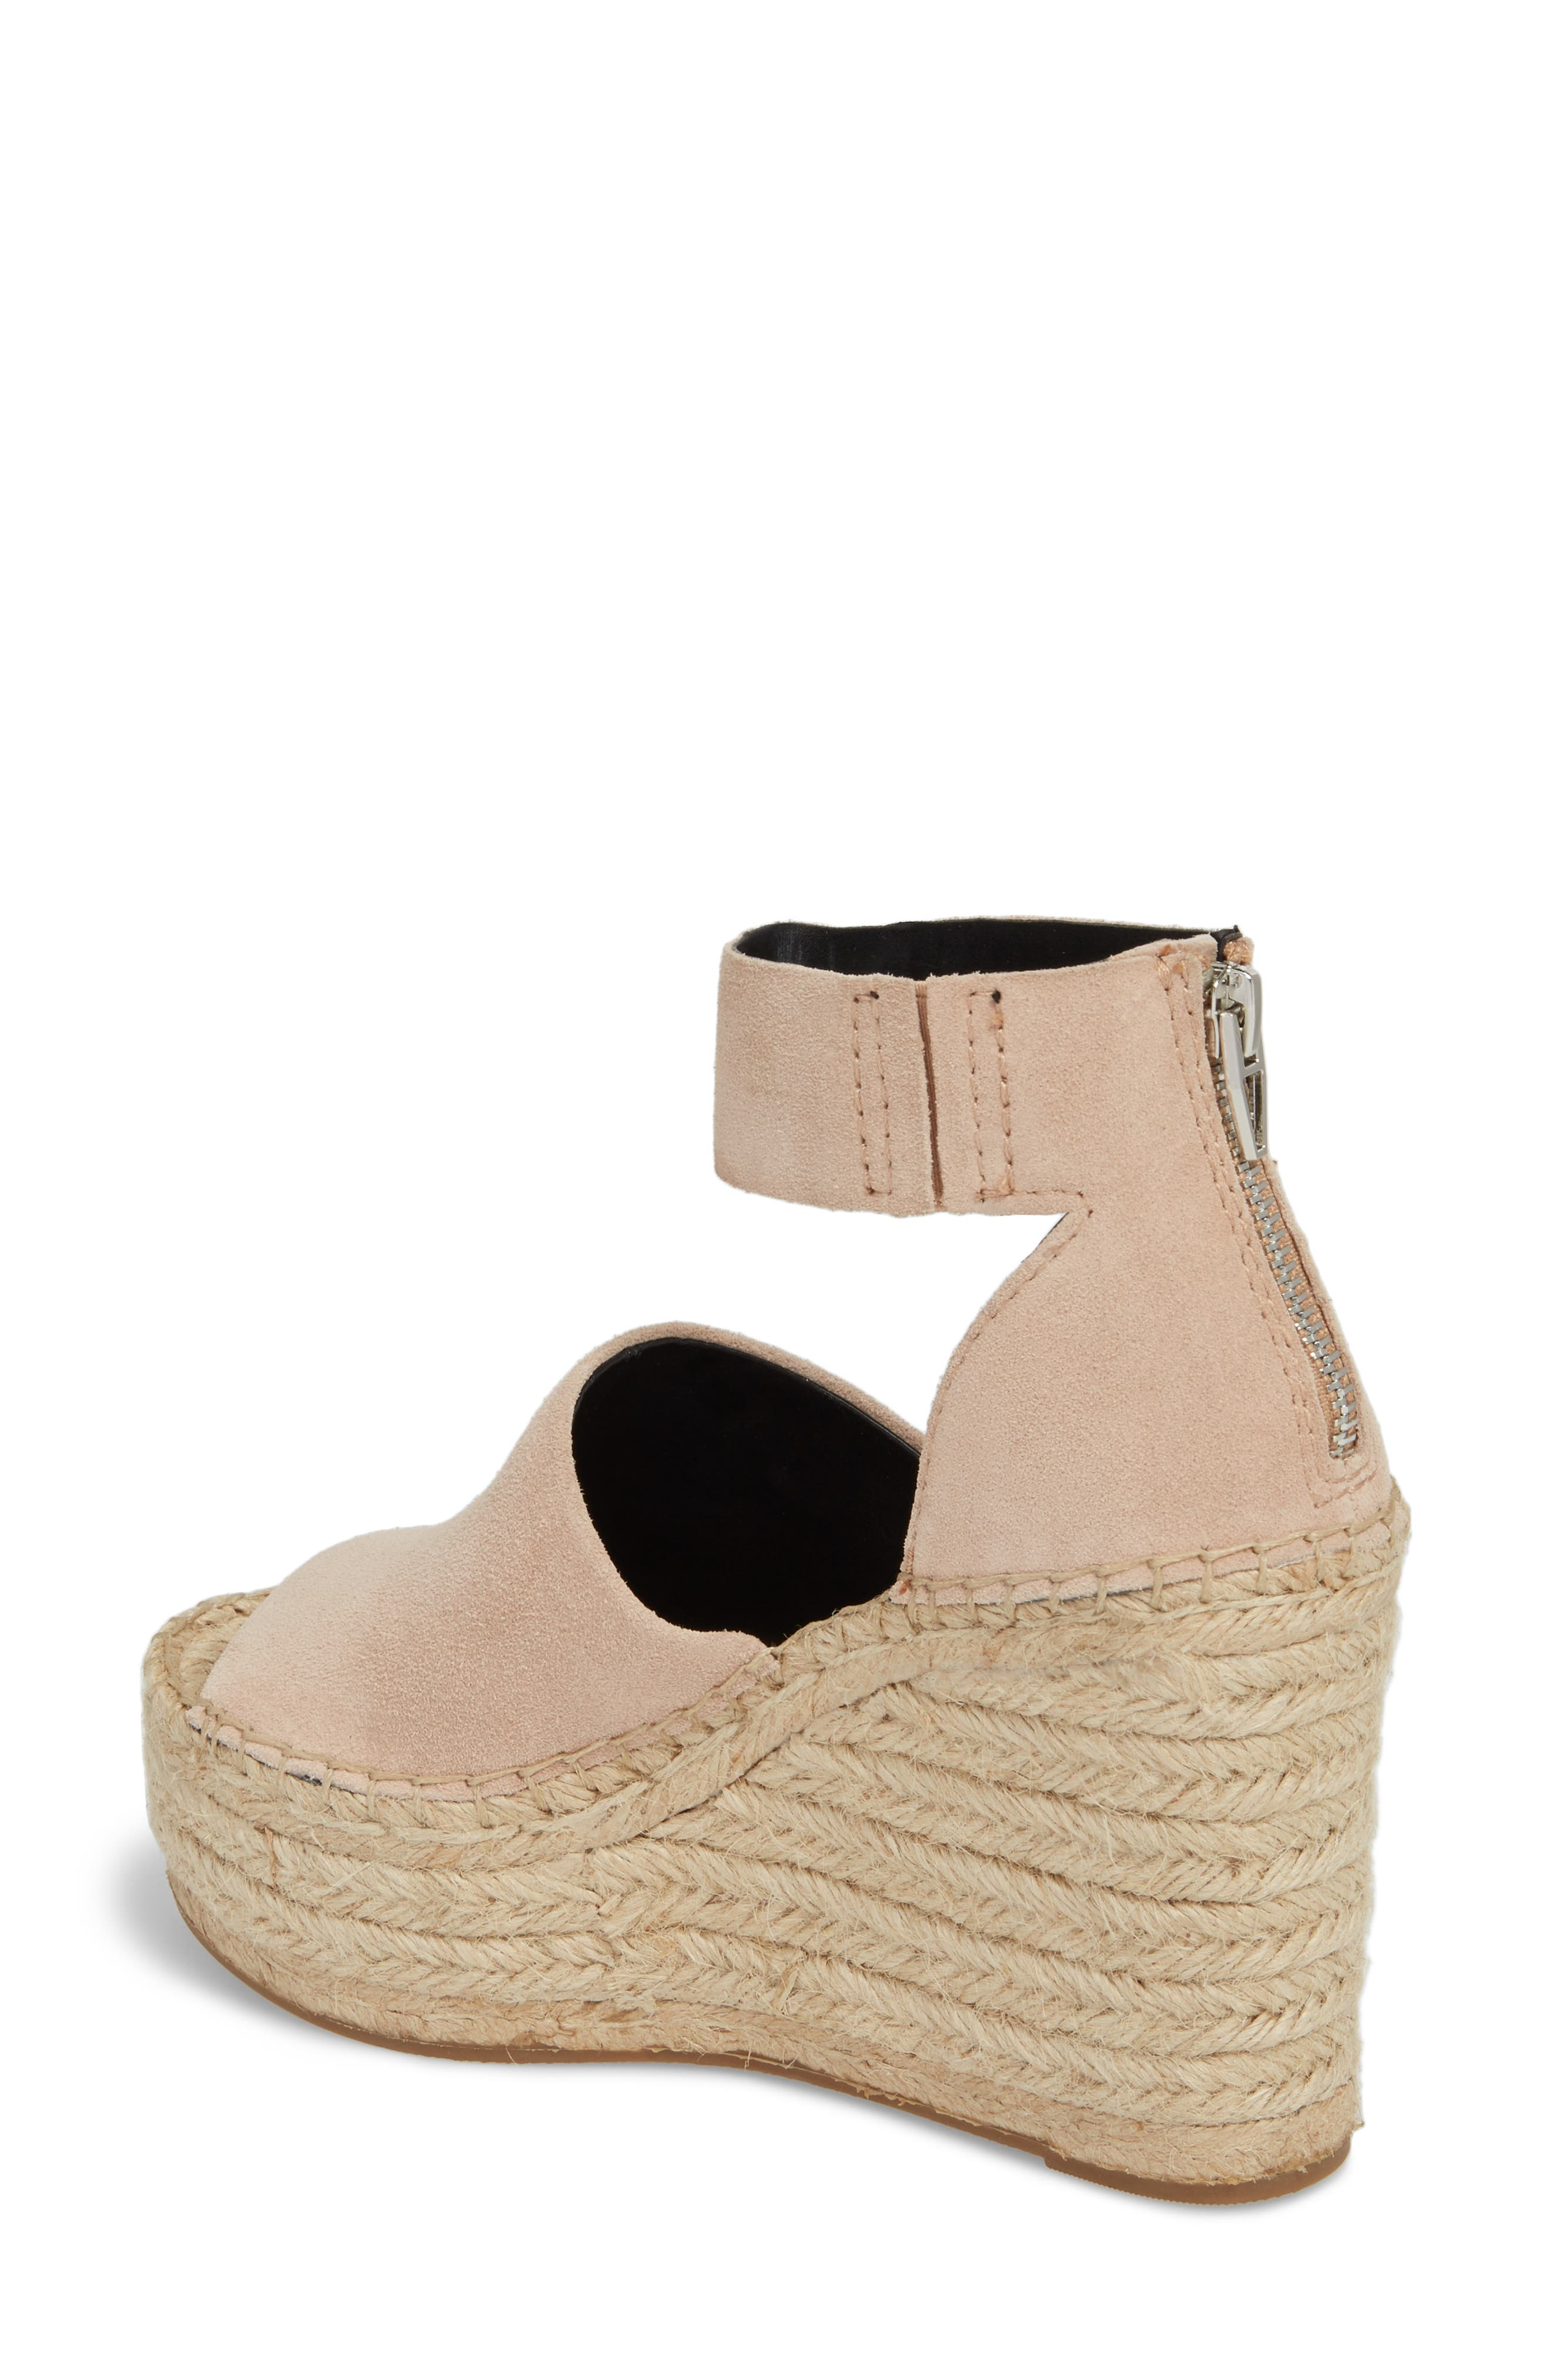 Alternate Image 2  - Dolce Vita Straw Wedge Espadrille Sandal (Women)